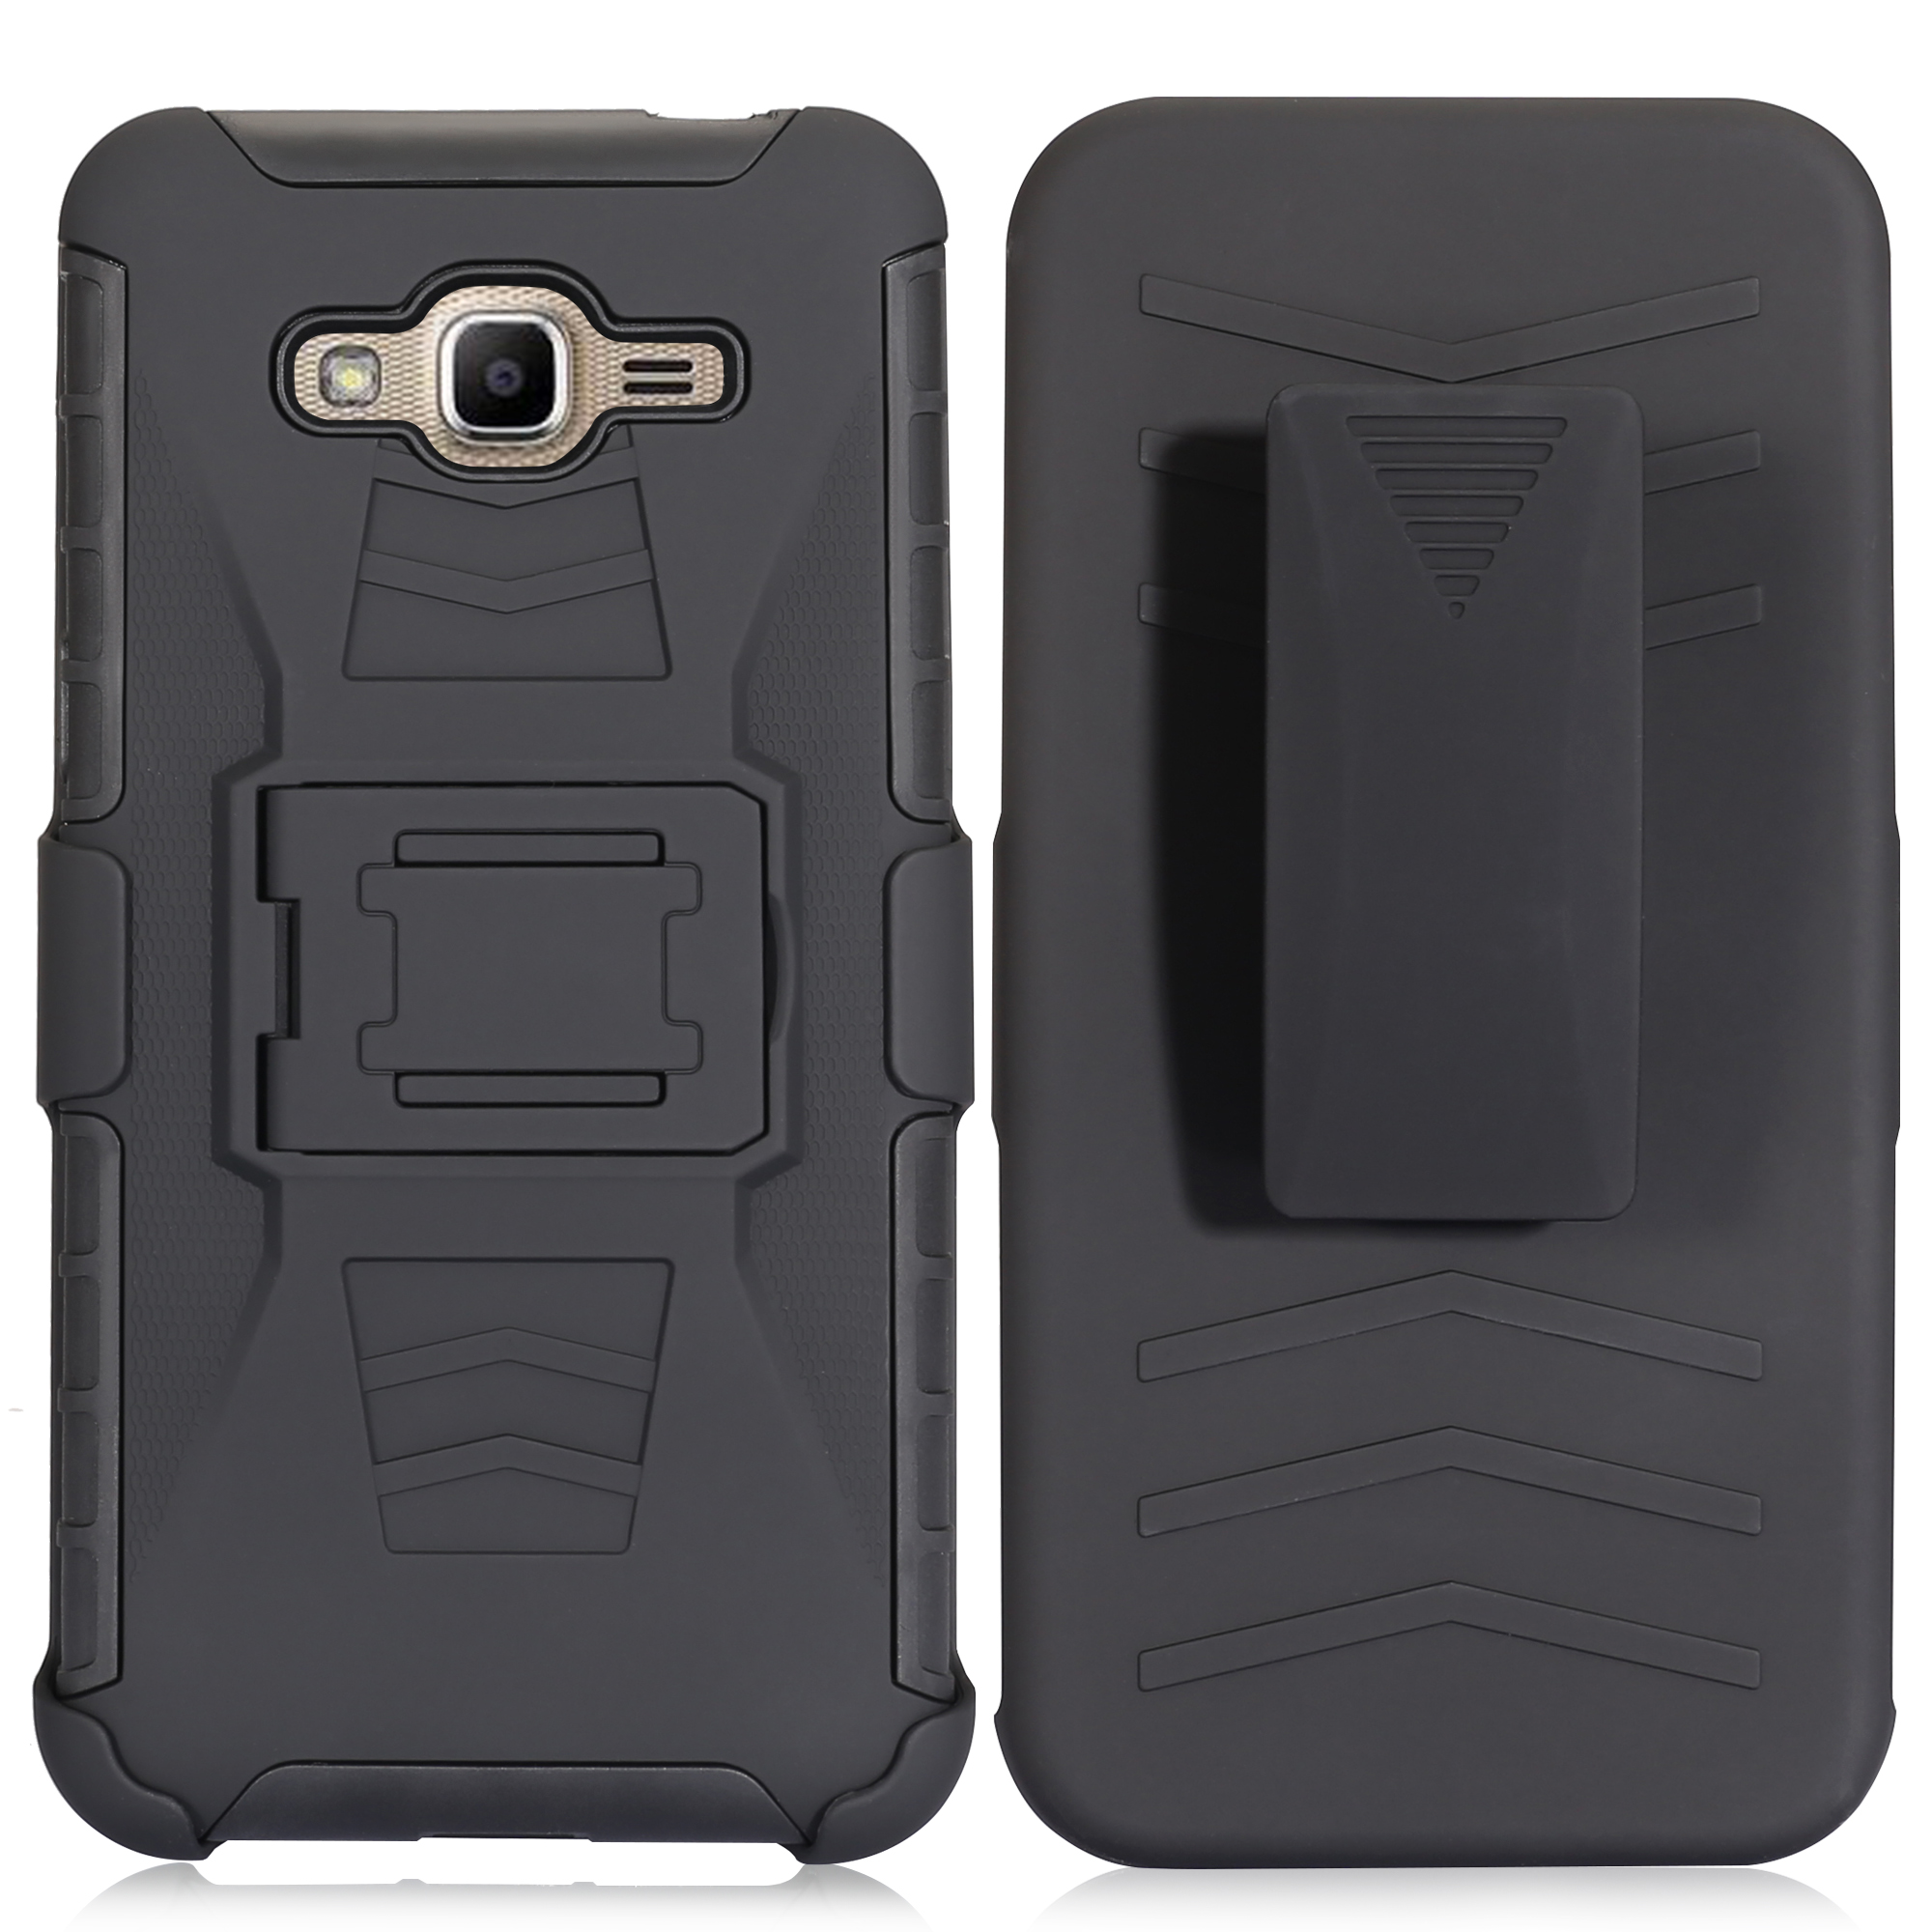 Coque antichoc militaire pour Samsung Galaxy J5 étui J5 J500 J500F 5 pouces étui pour Samsung J5 antichoc hybride Clip ceinture